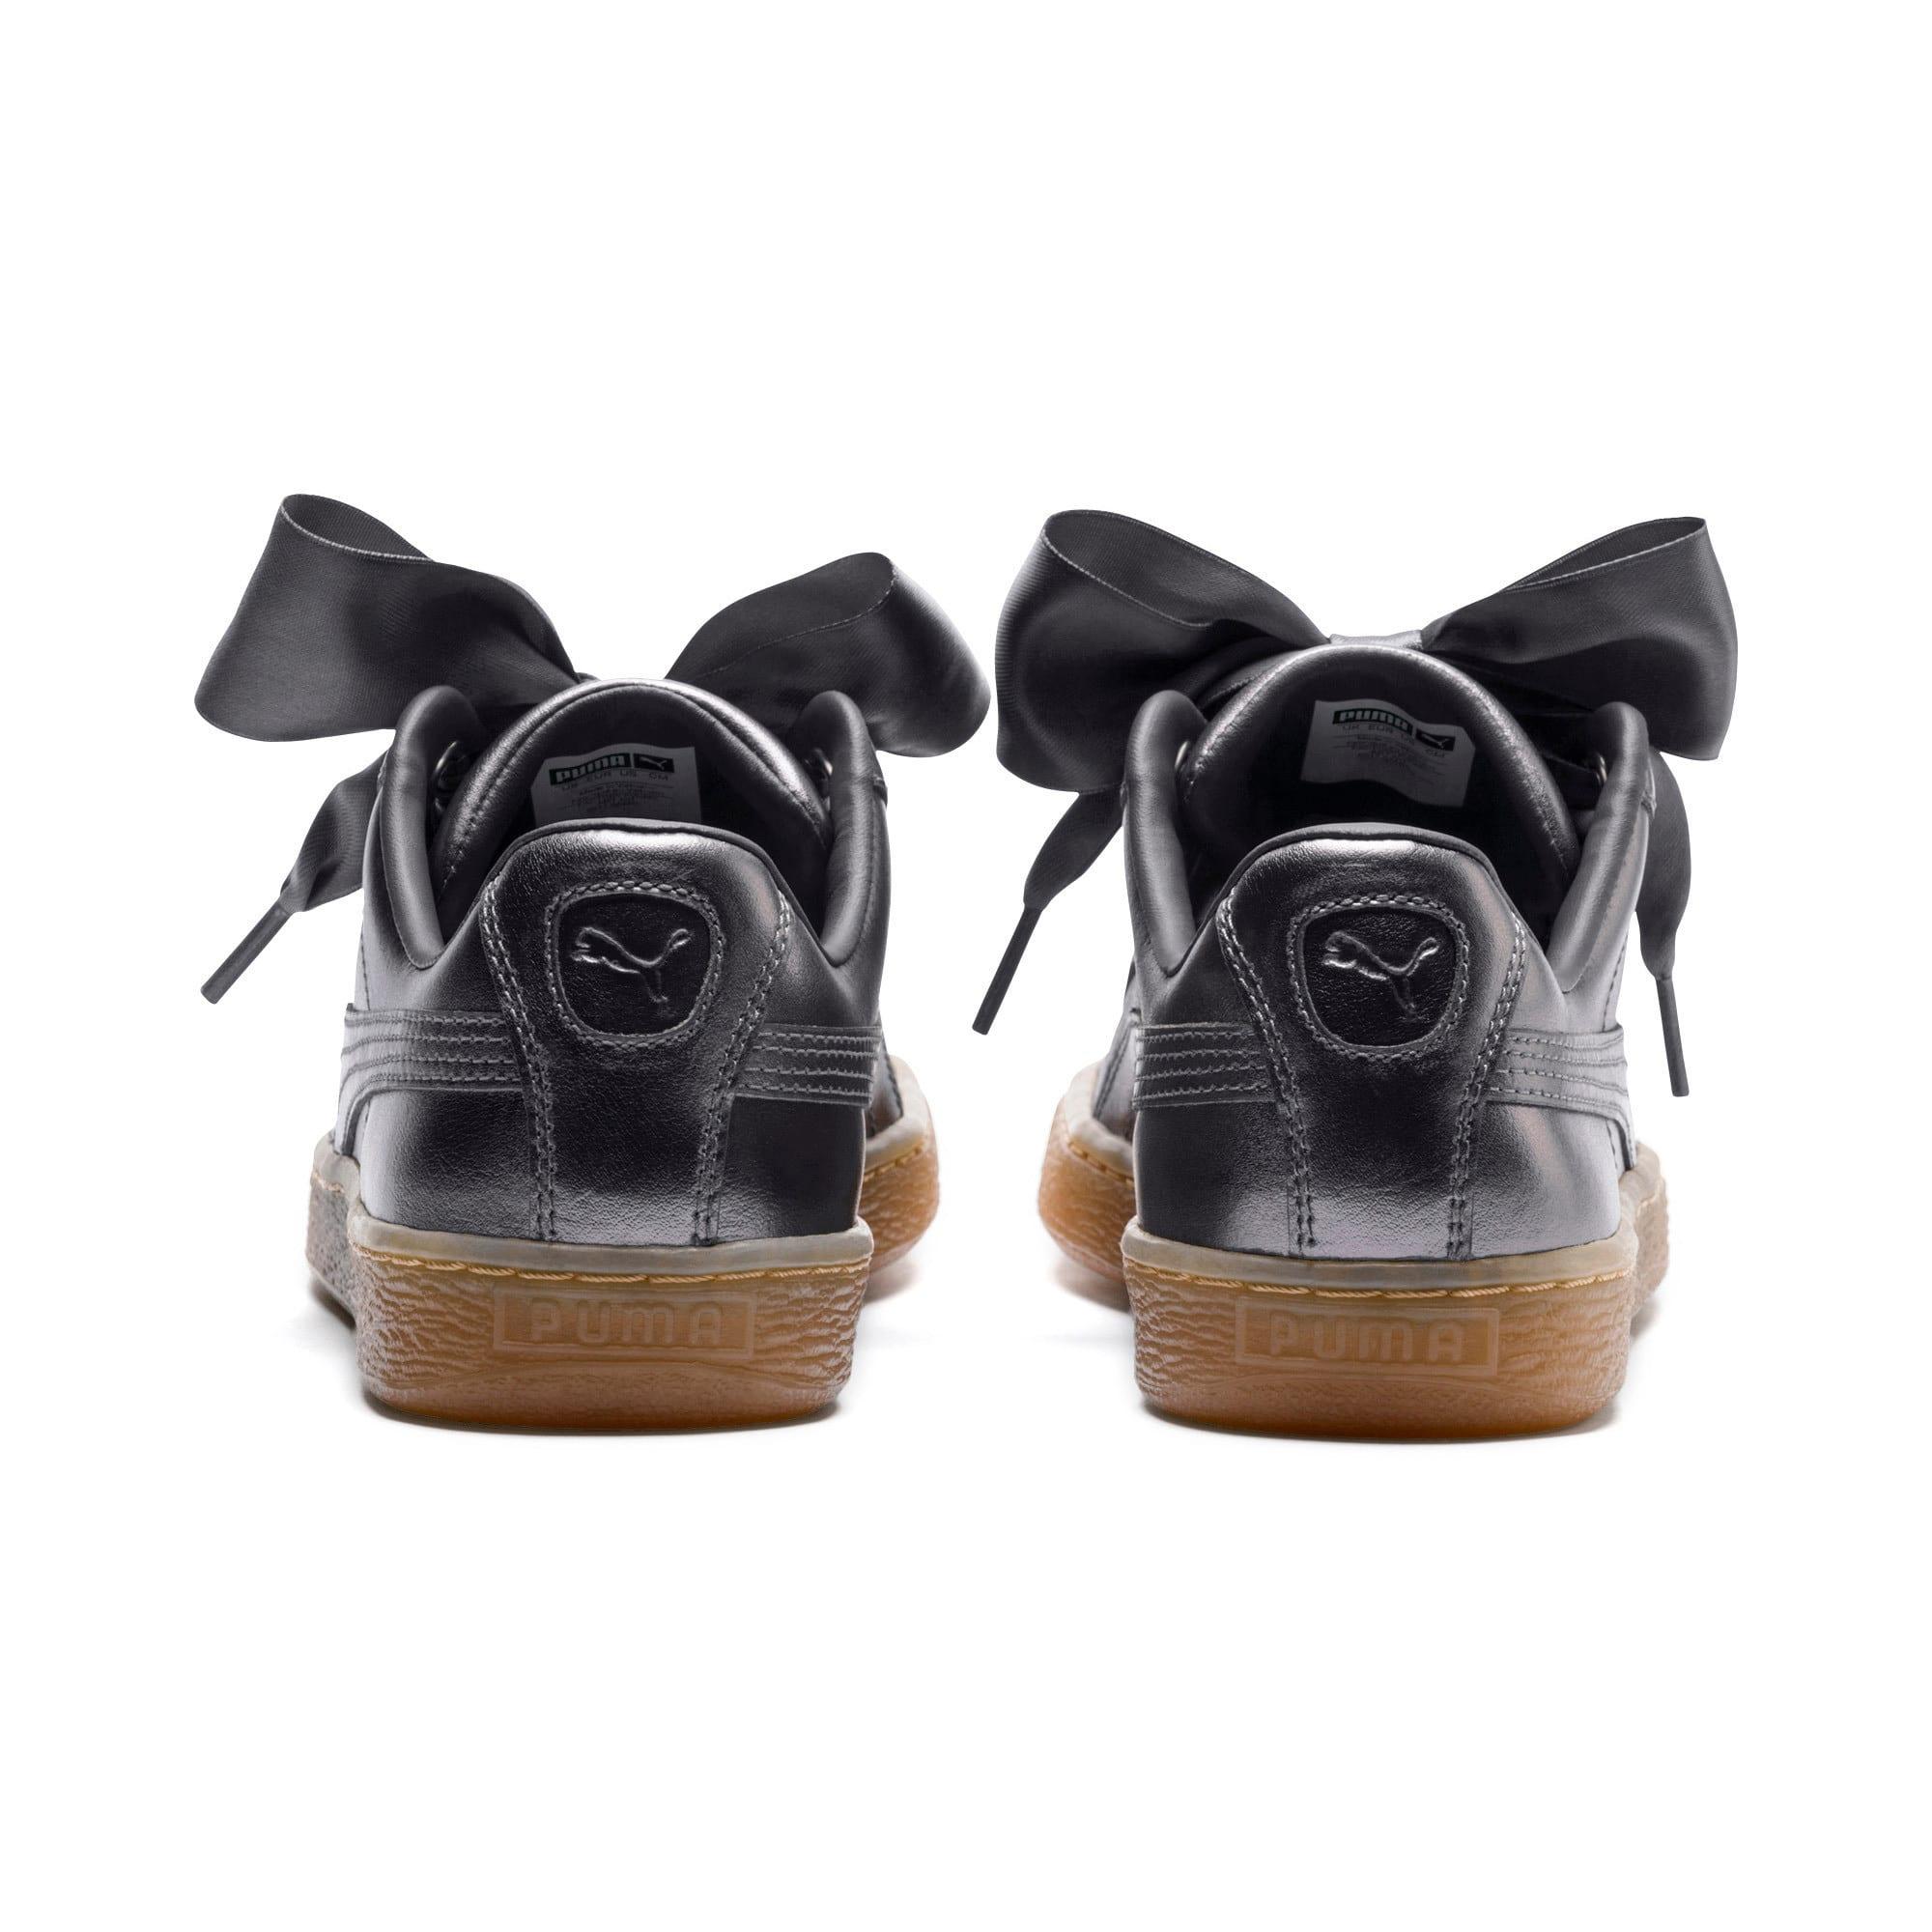 Thumbnail 4 of Basket Heart Luxe Women's Sneakers, QUIET SHADE-QUIET SHADE, medium